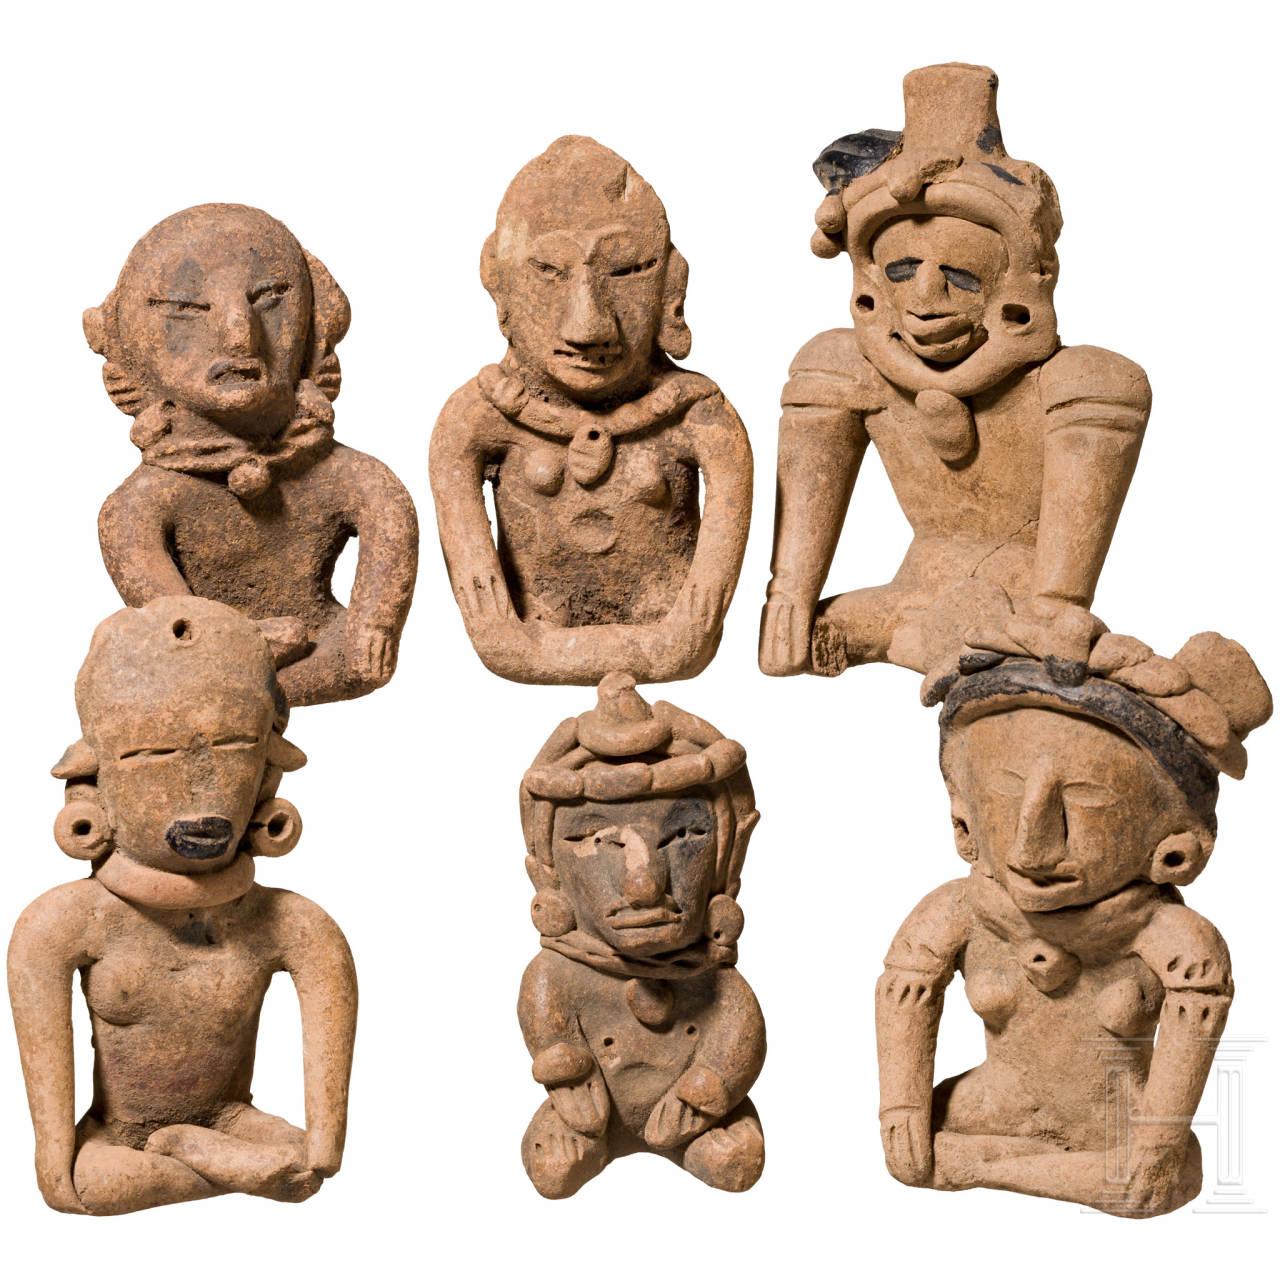 Gruppe von sechs sitzenden Terrakottafiguren, West-Mexiko